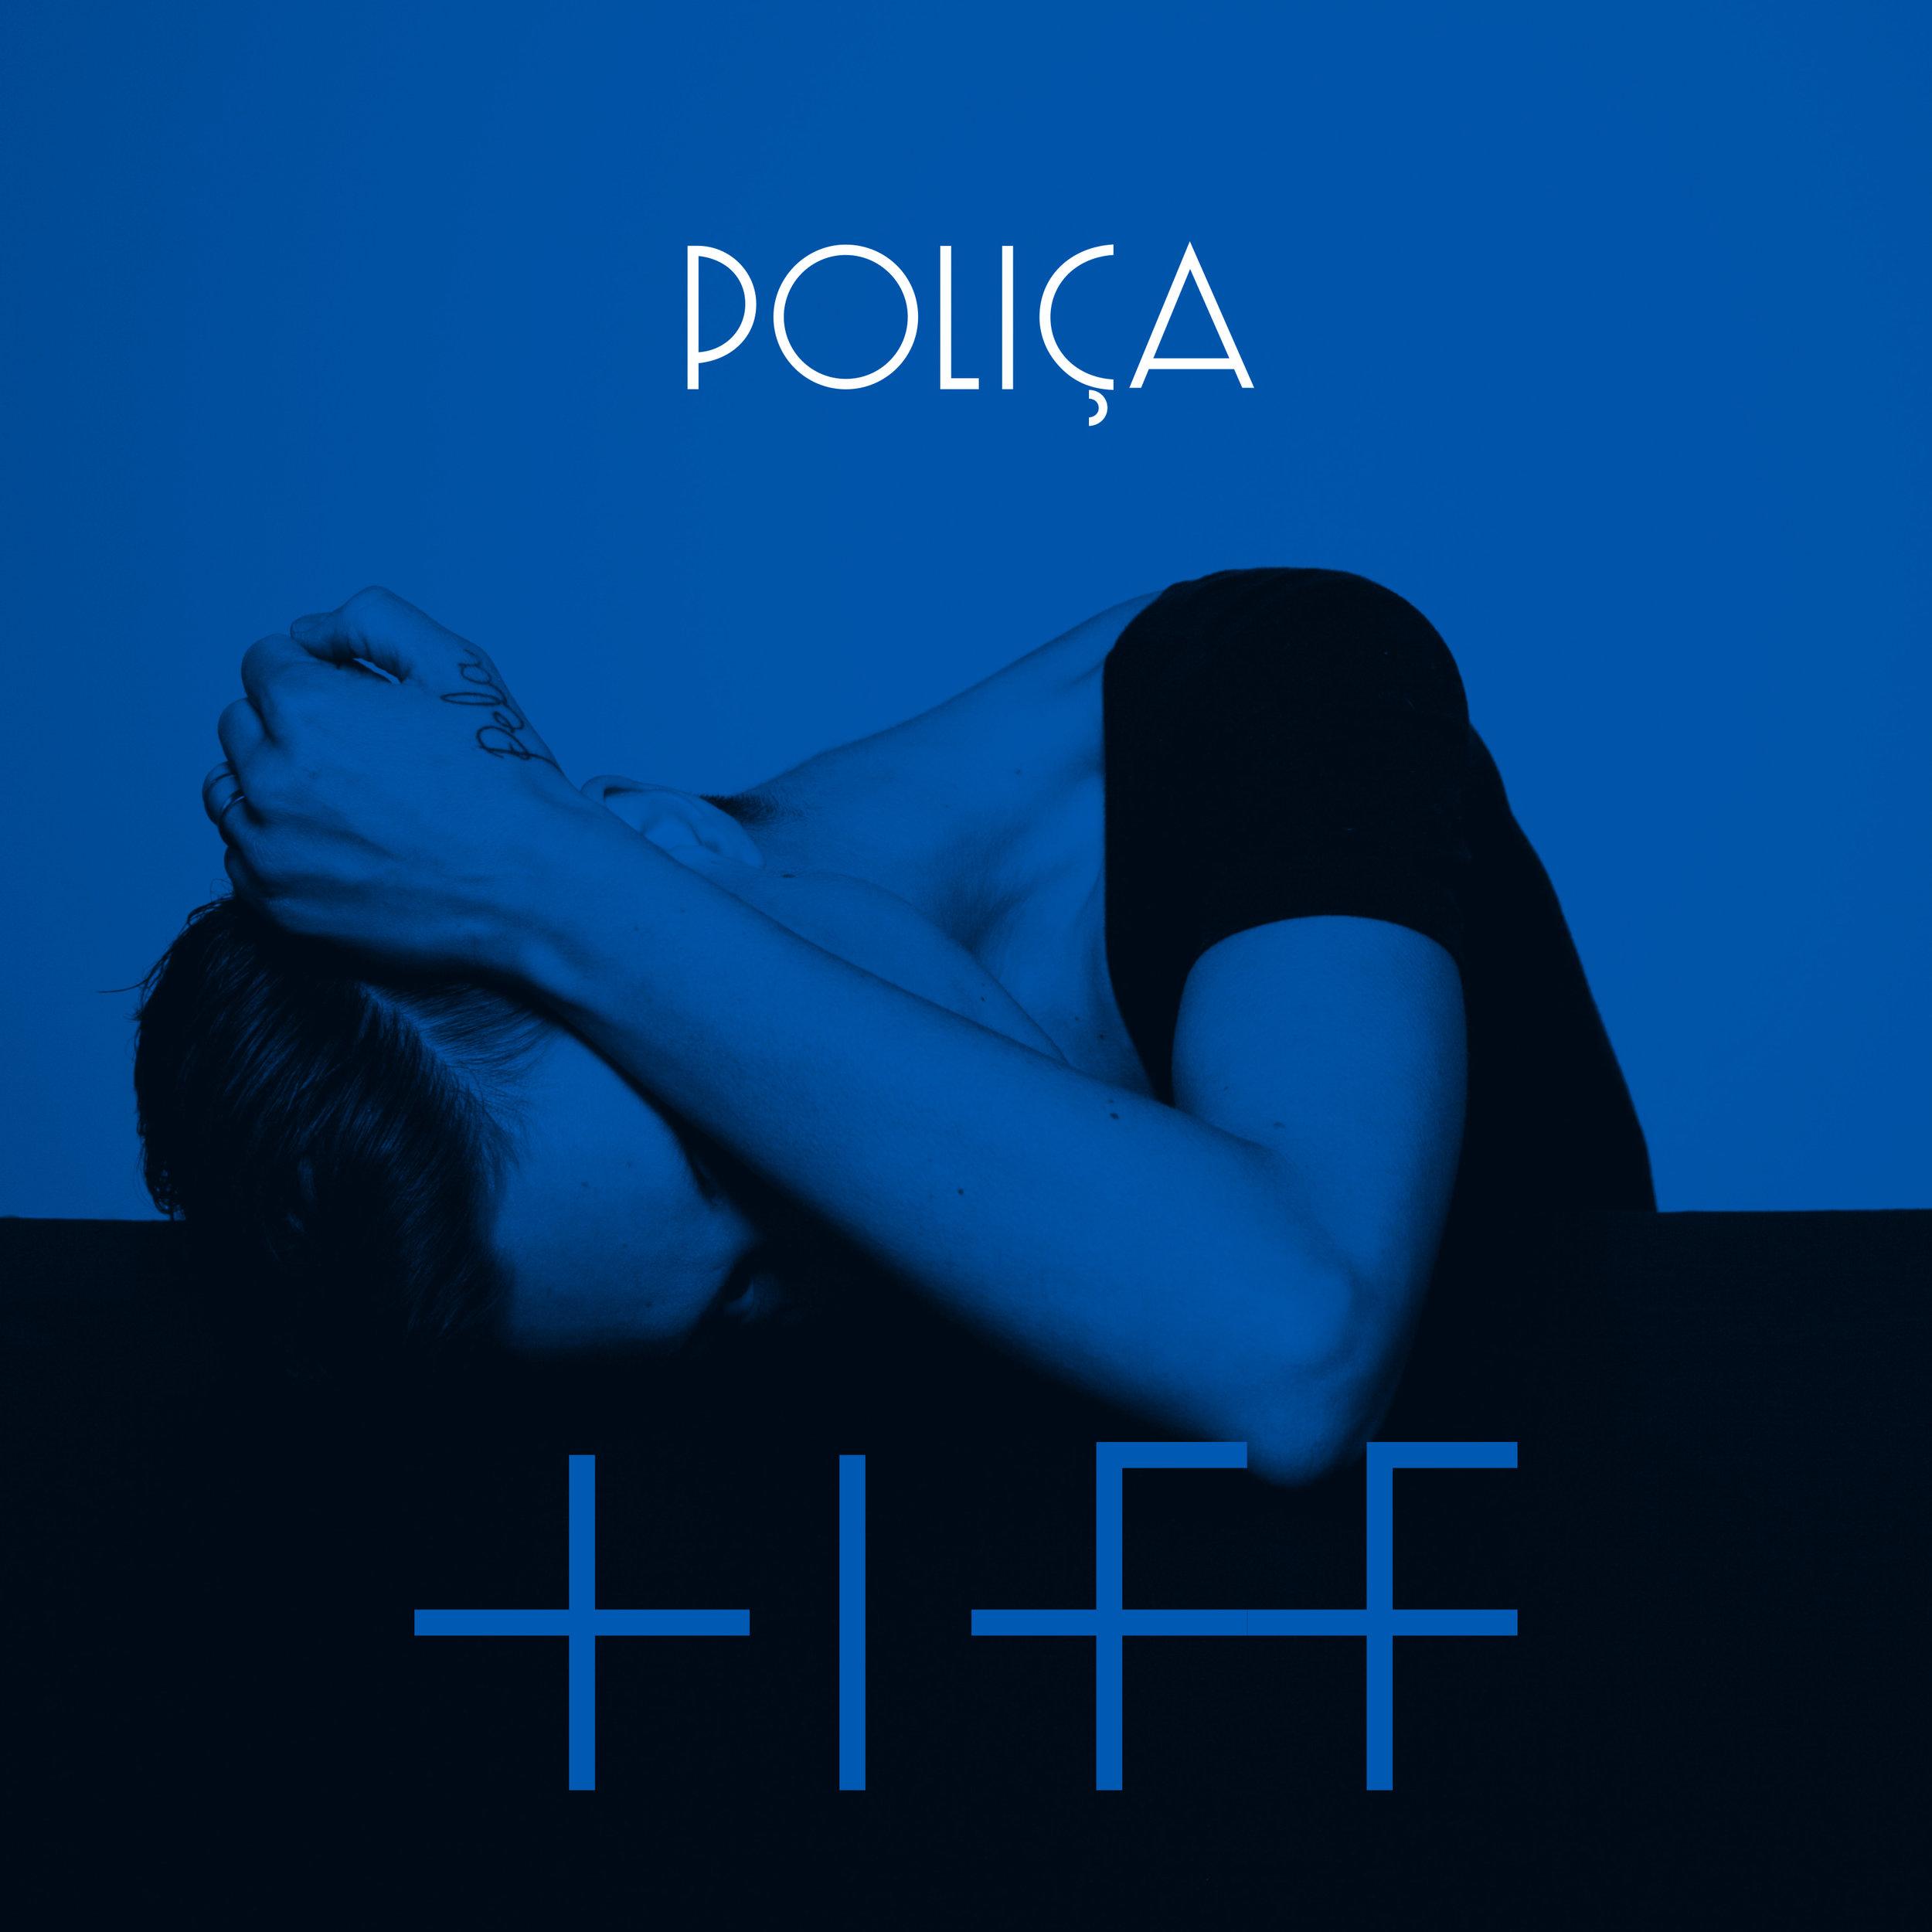 polica_tiff_final